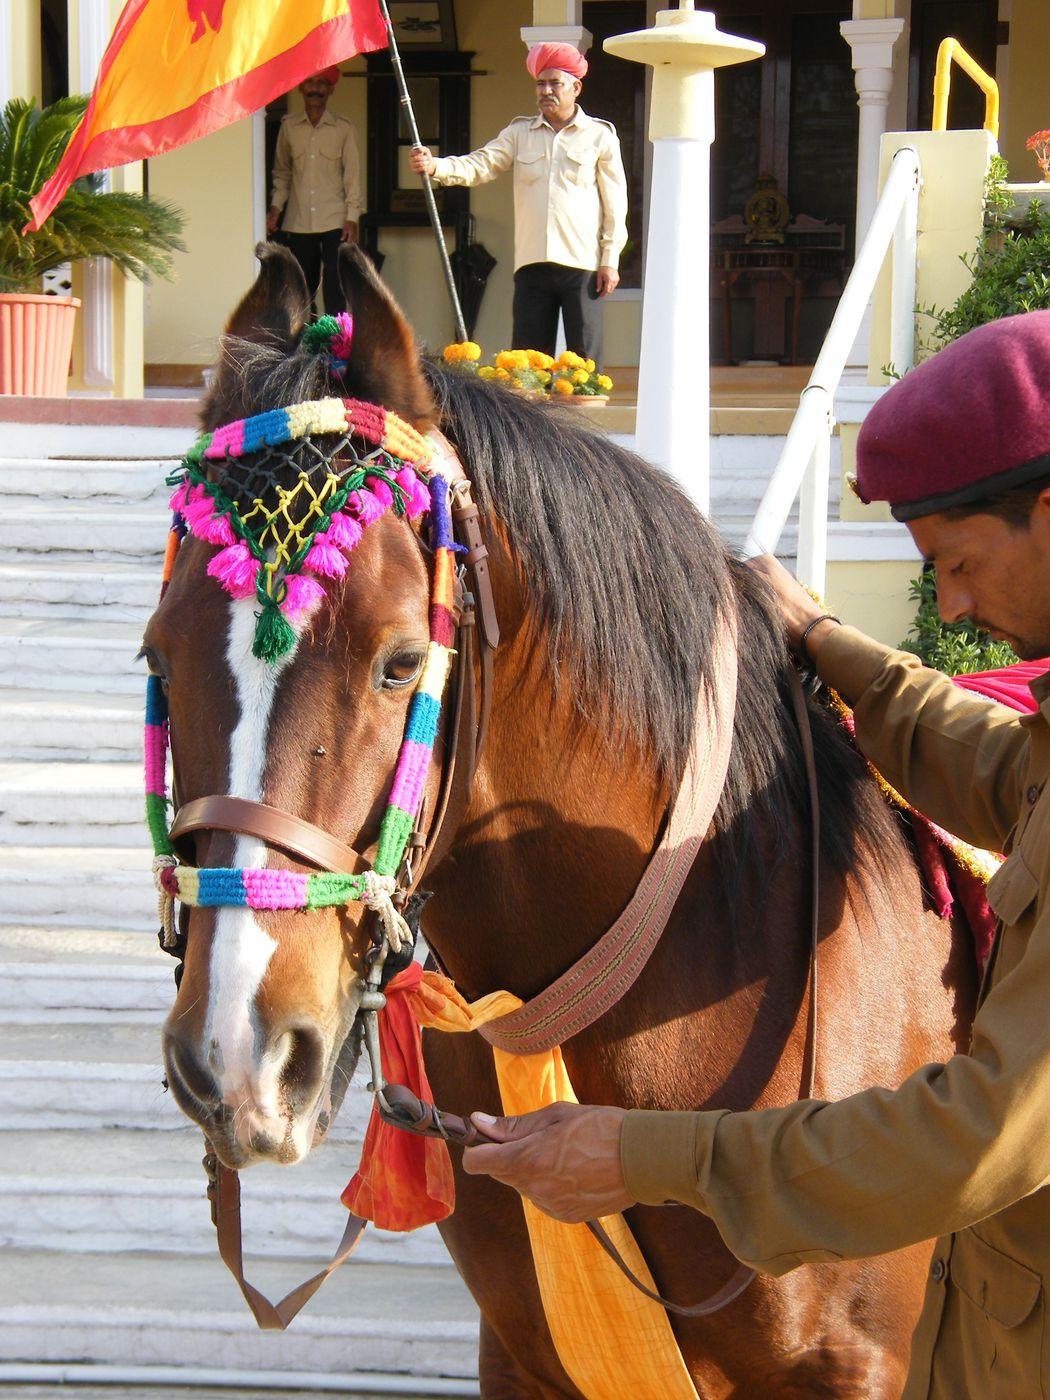 Marwari Horses and Indian Culture itinerary.